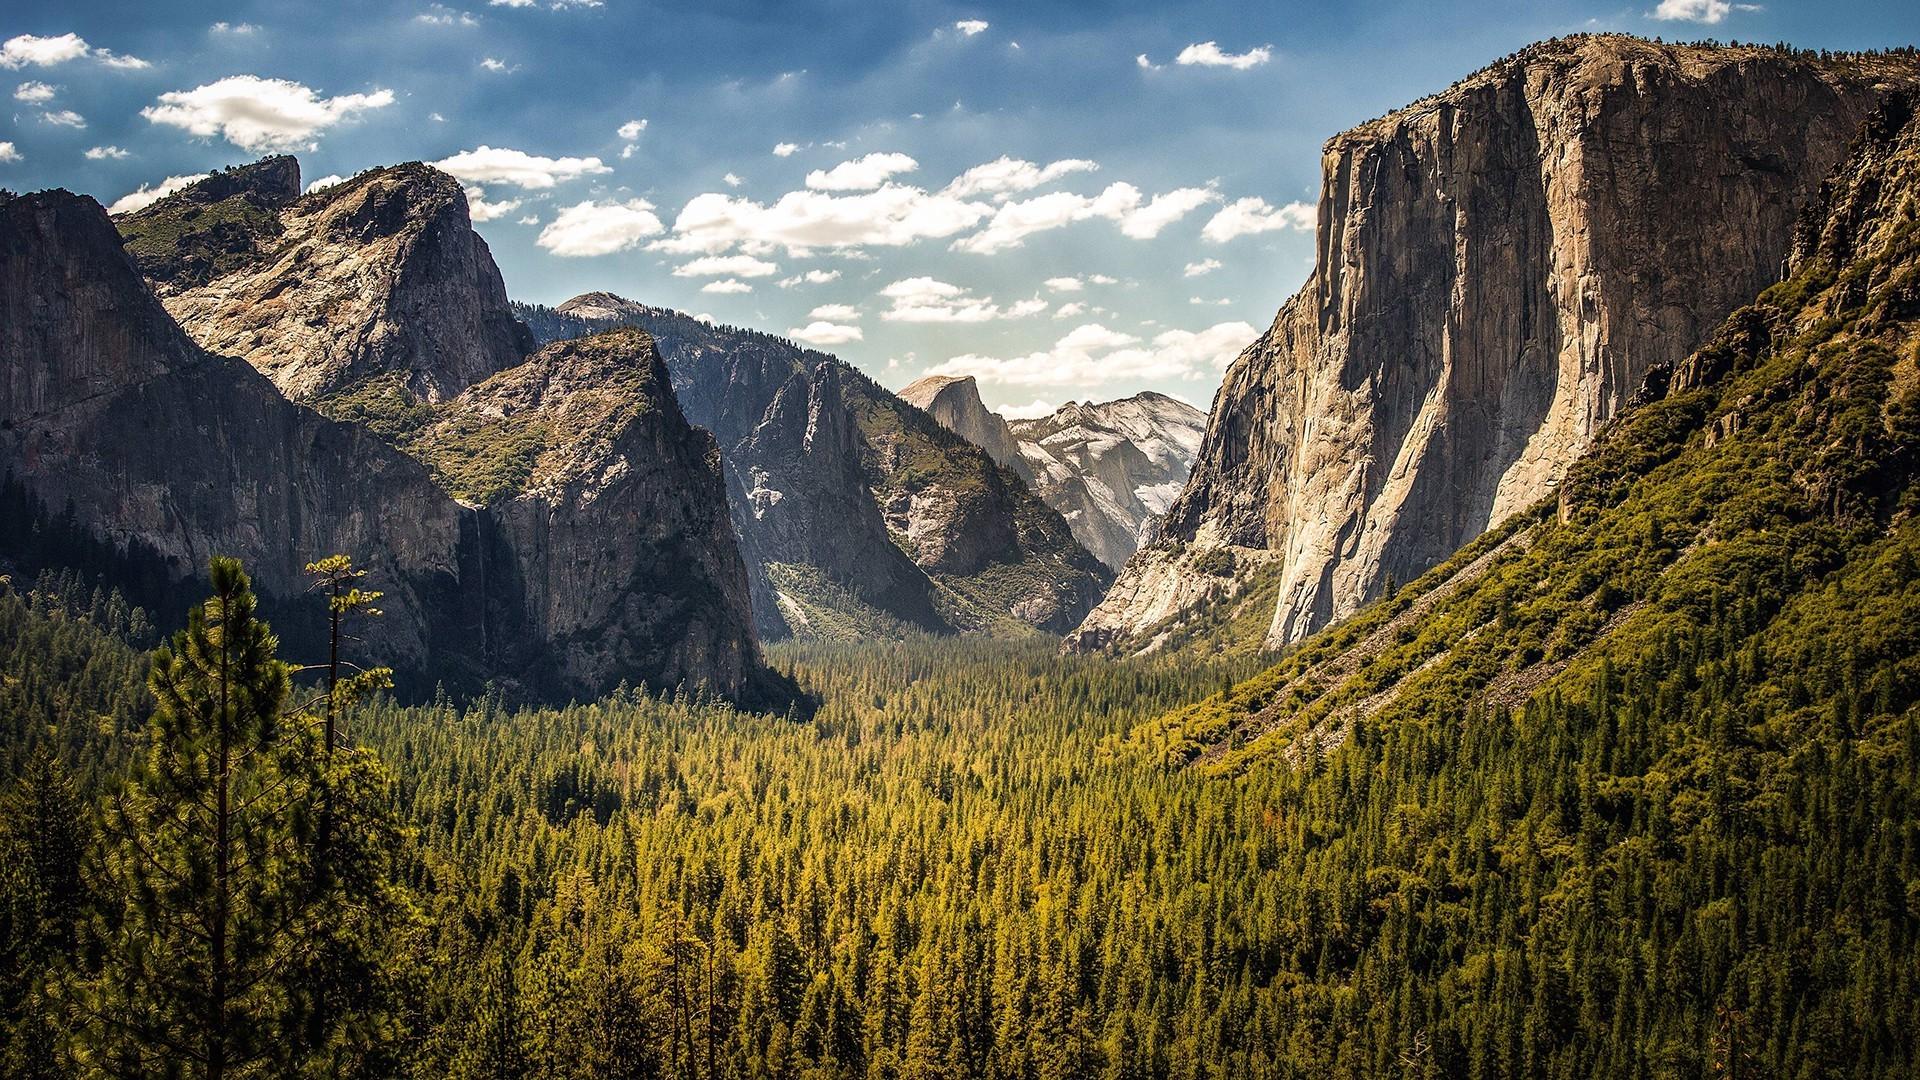 Fall Coastal Desktop Wallpaper Yosemite National Park Wallpaper Hd 58 Images